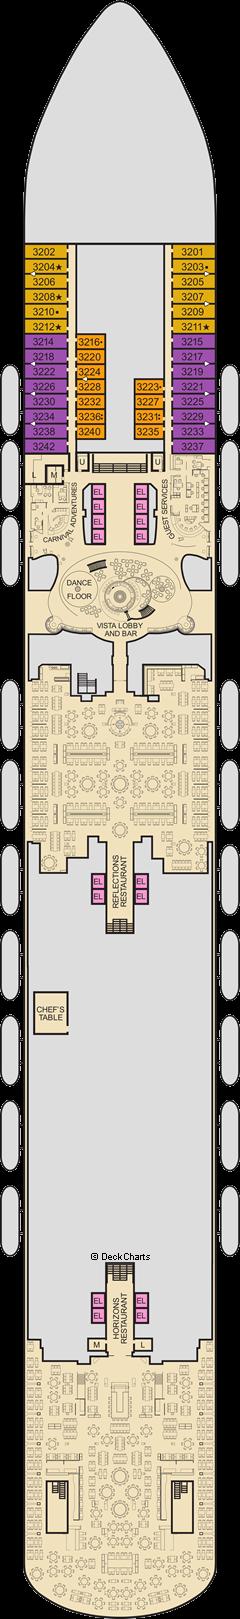 Carnival Vista: Lobby Deck